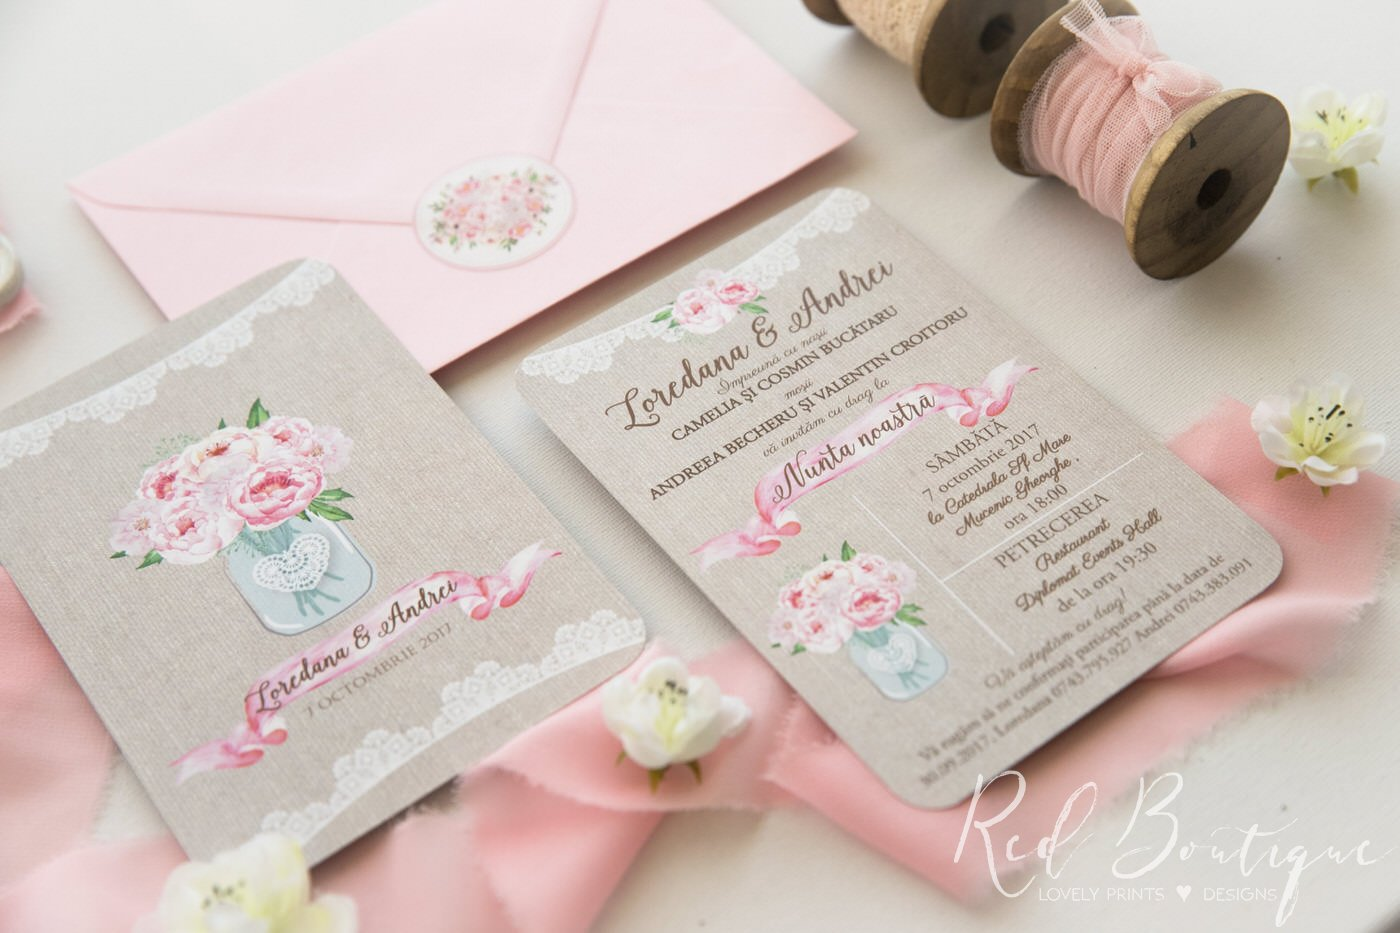 invitatie de nunta rustica cu buchet de bujori roz in borcan si dantela